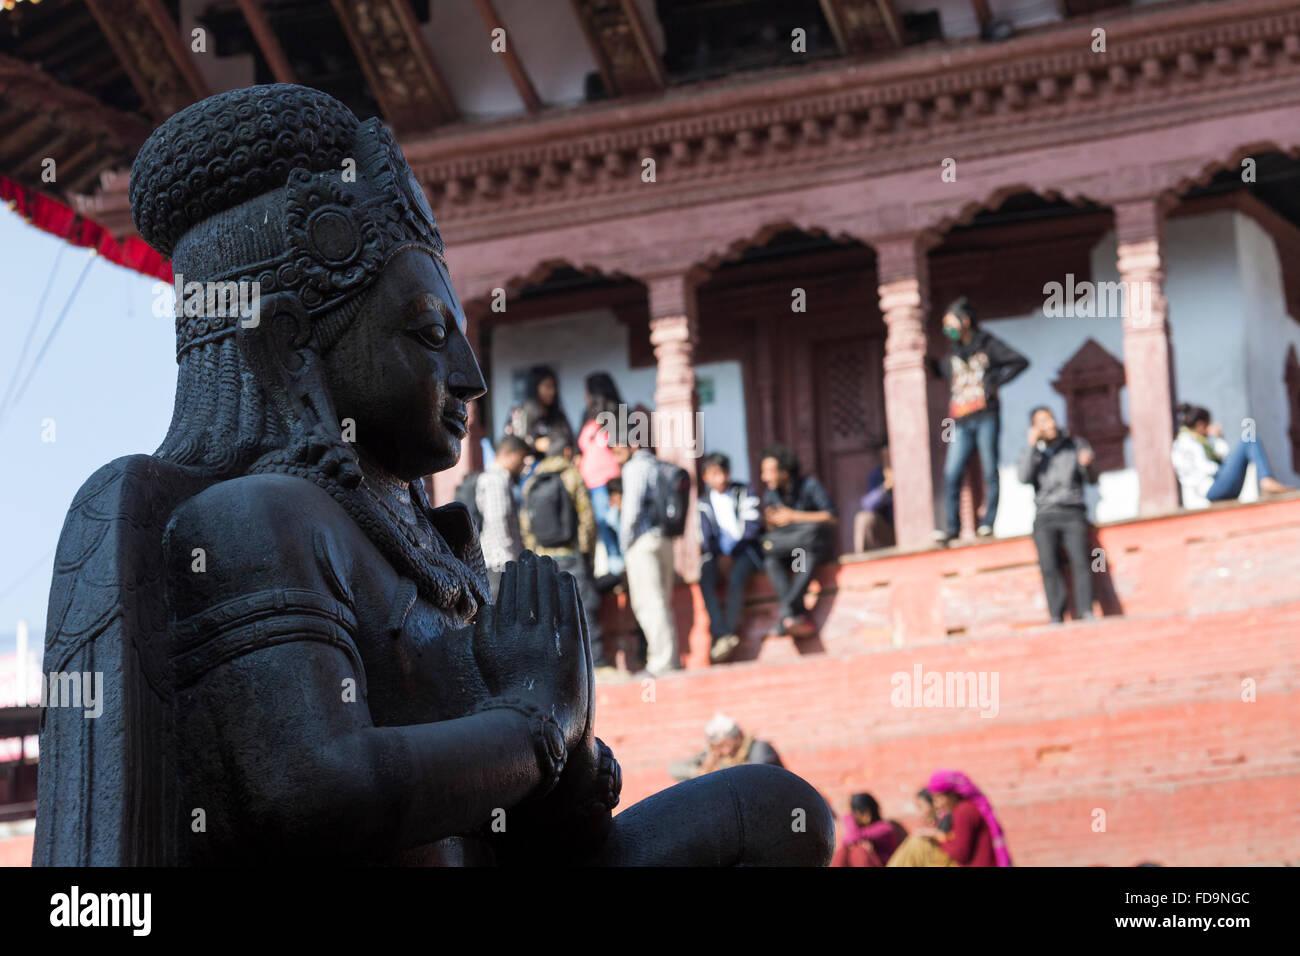 Kathmandu's Durbar Square, Nepal - Stock Image